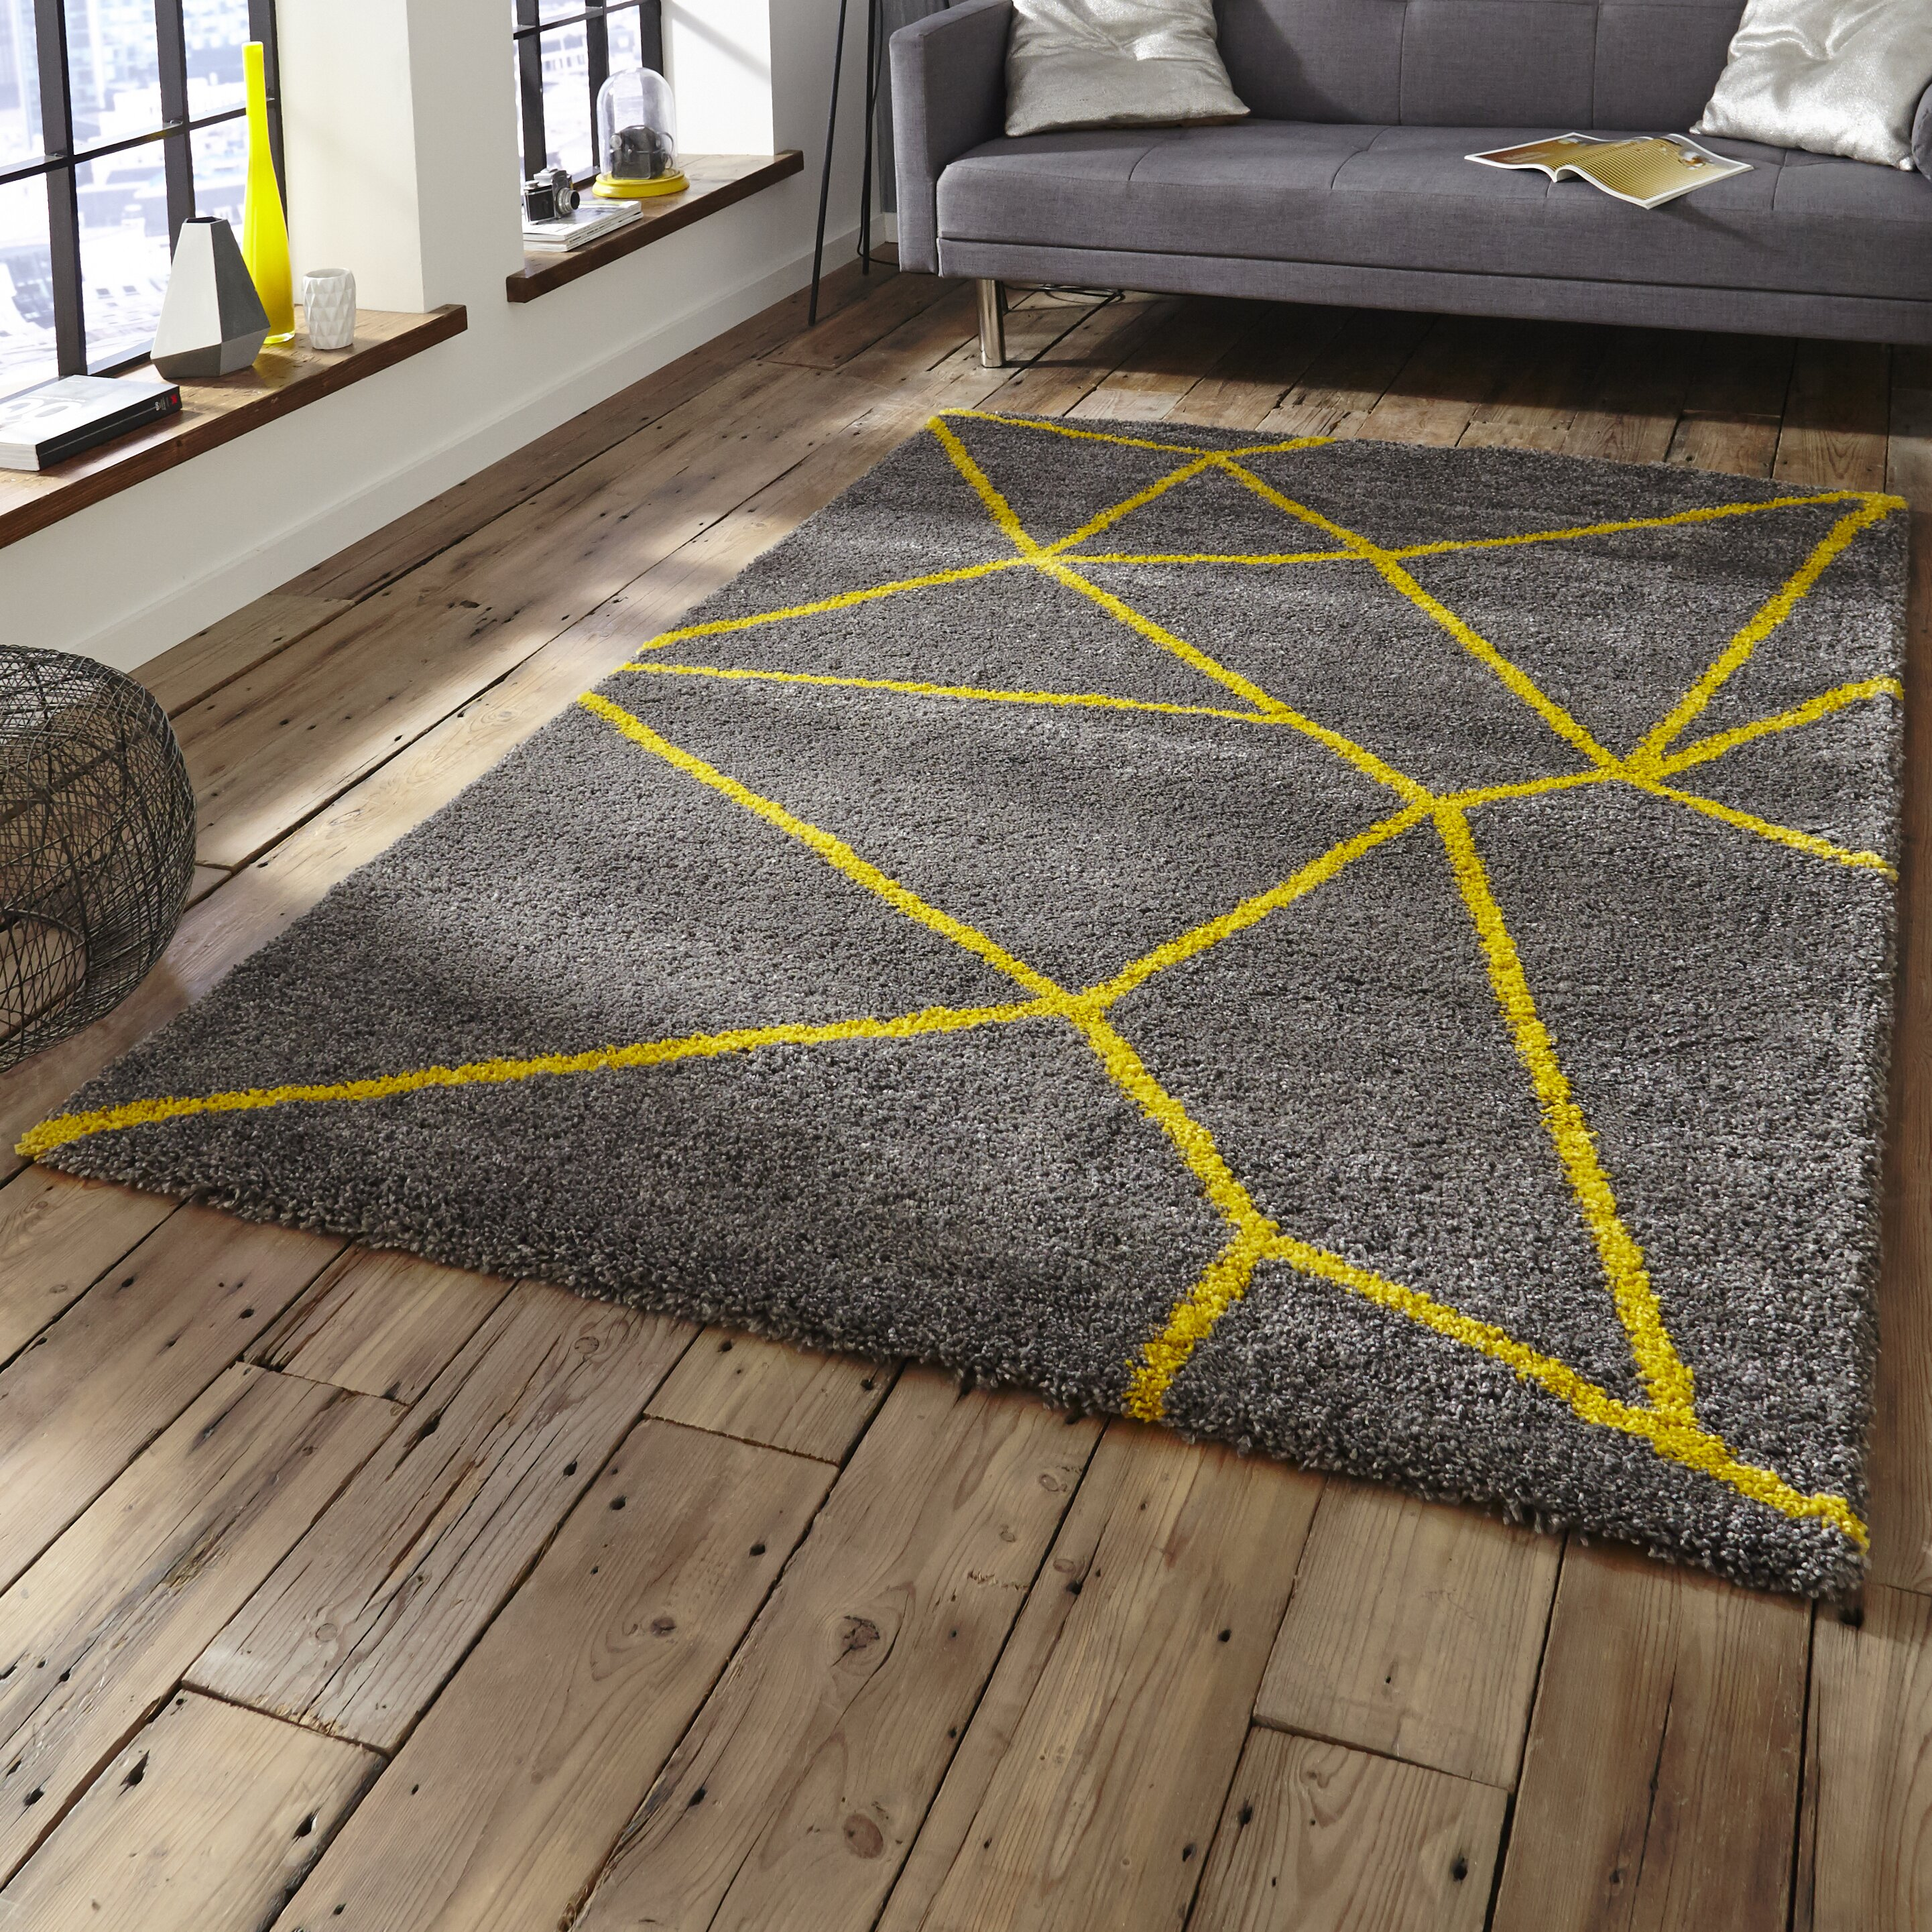 caracella royal nomadic grey yellow area rug reviews wayfair uk. Black Bedroom Furniture Sets. Home Design Ideas